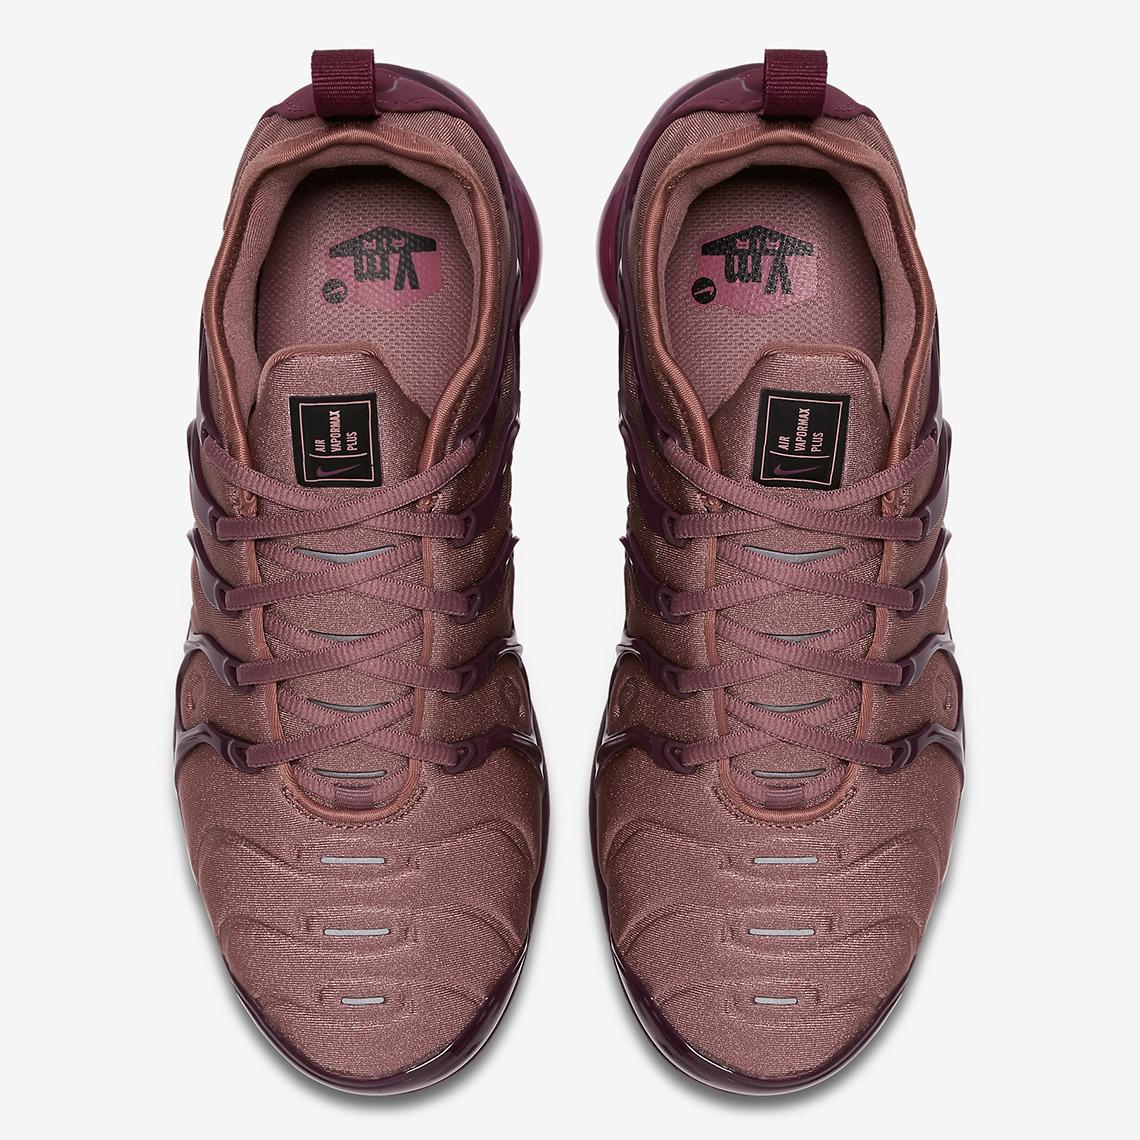 Date Release Max Vapor Air Nike Plus